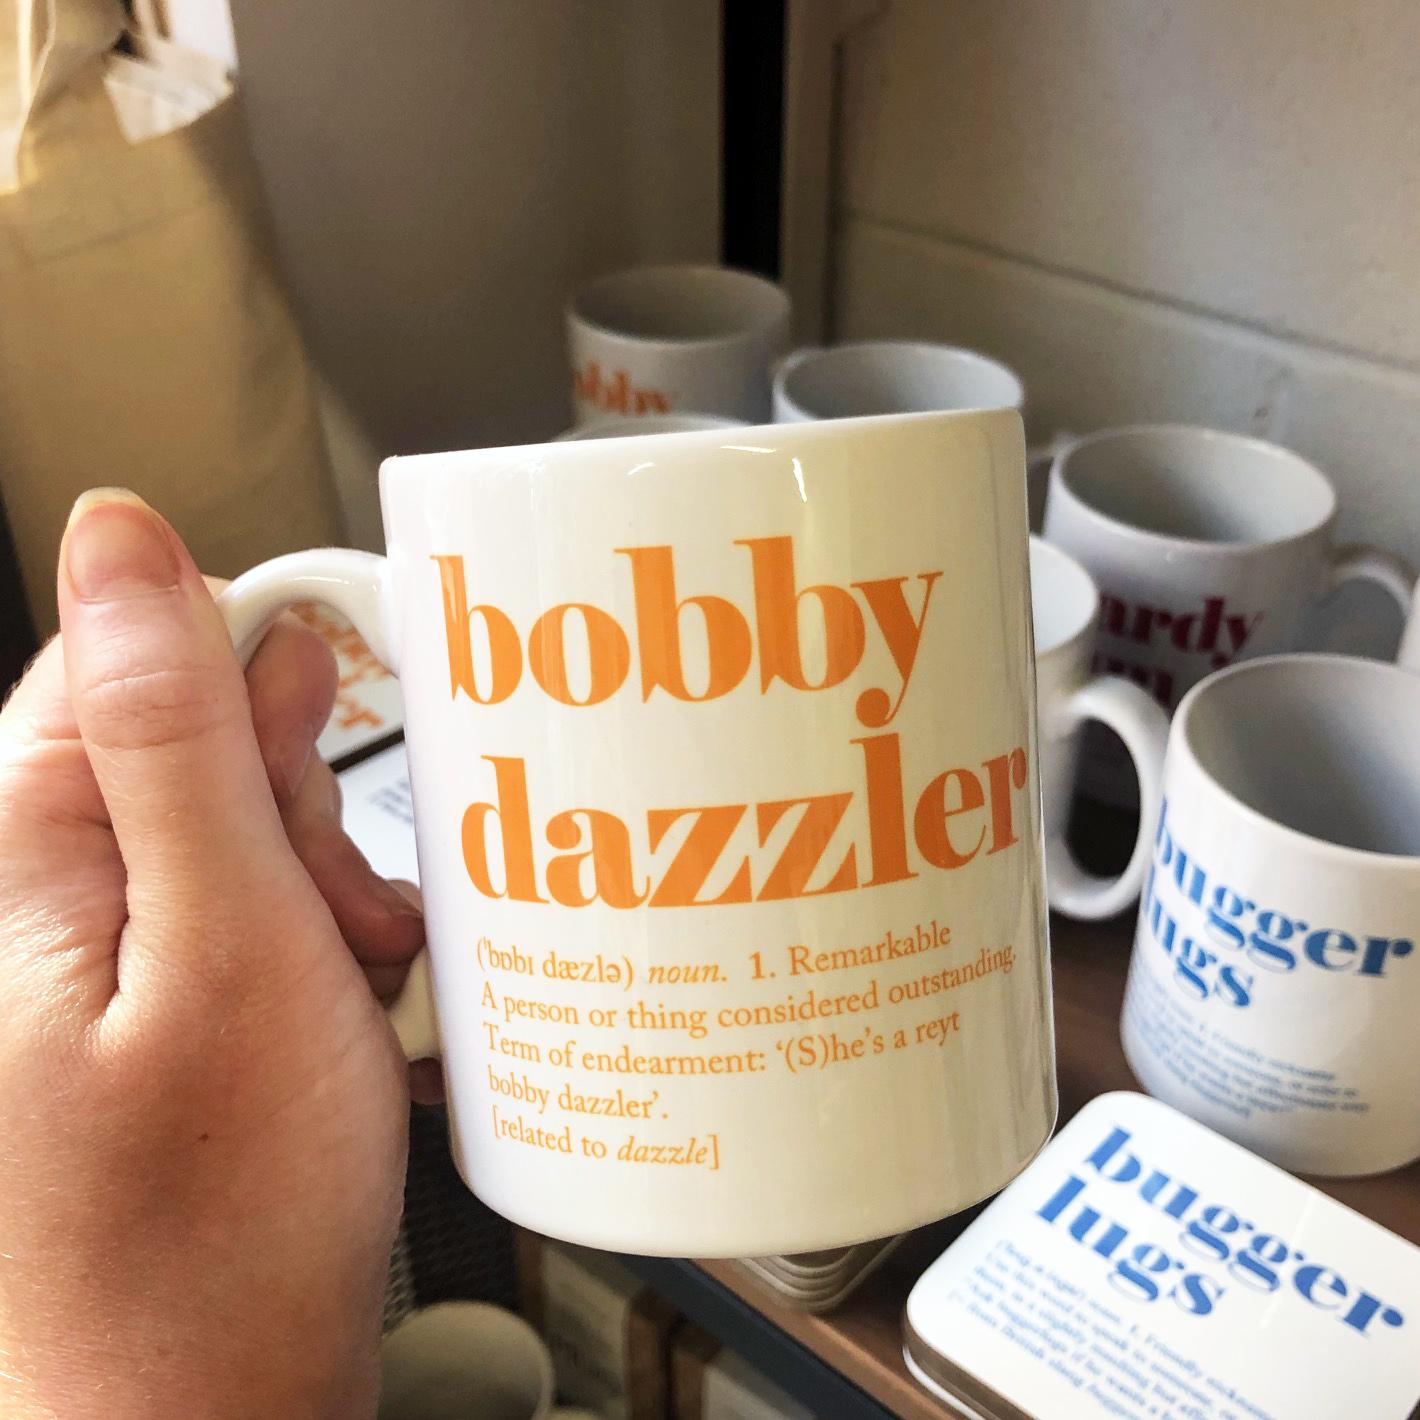 bobby dazzler mug